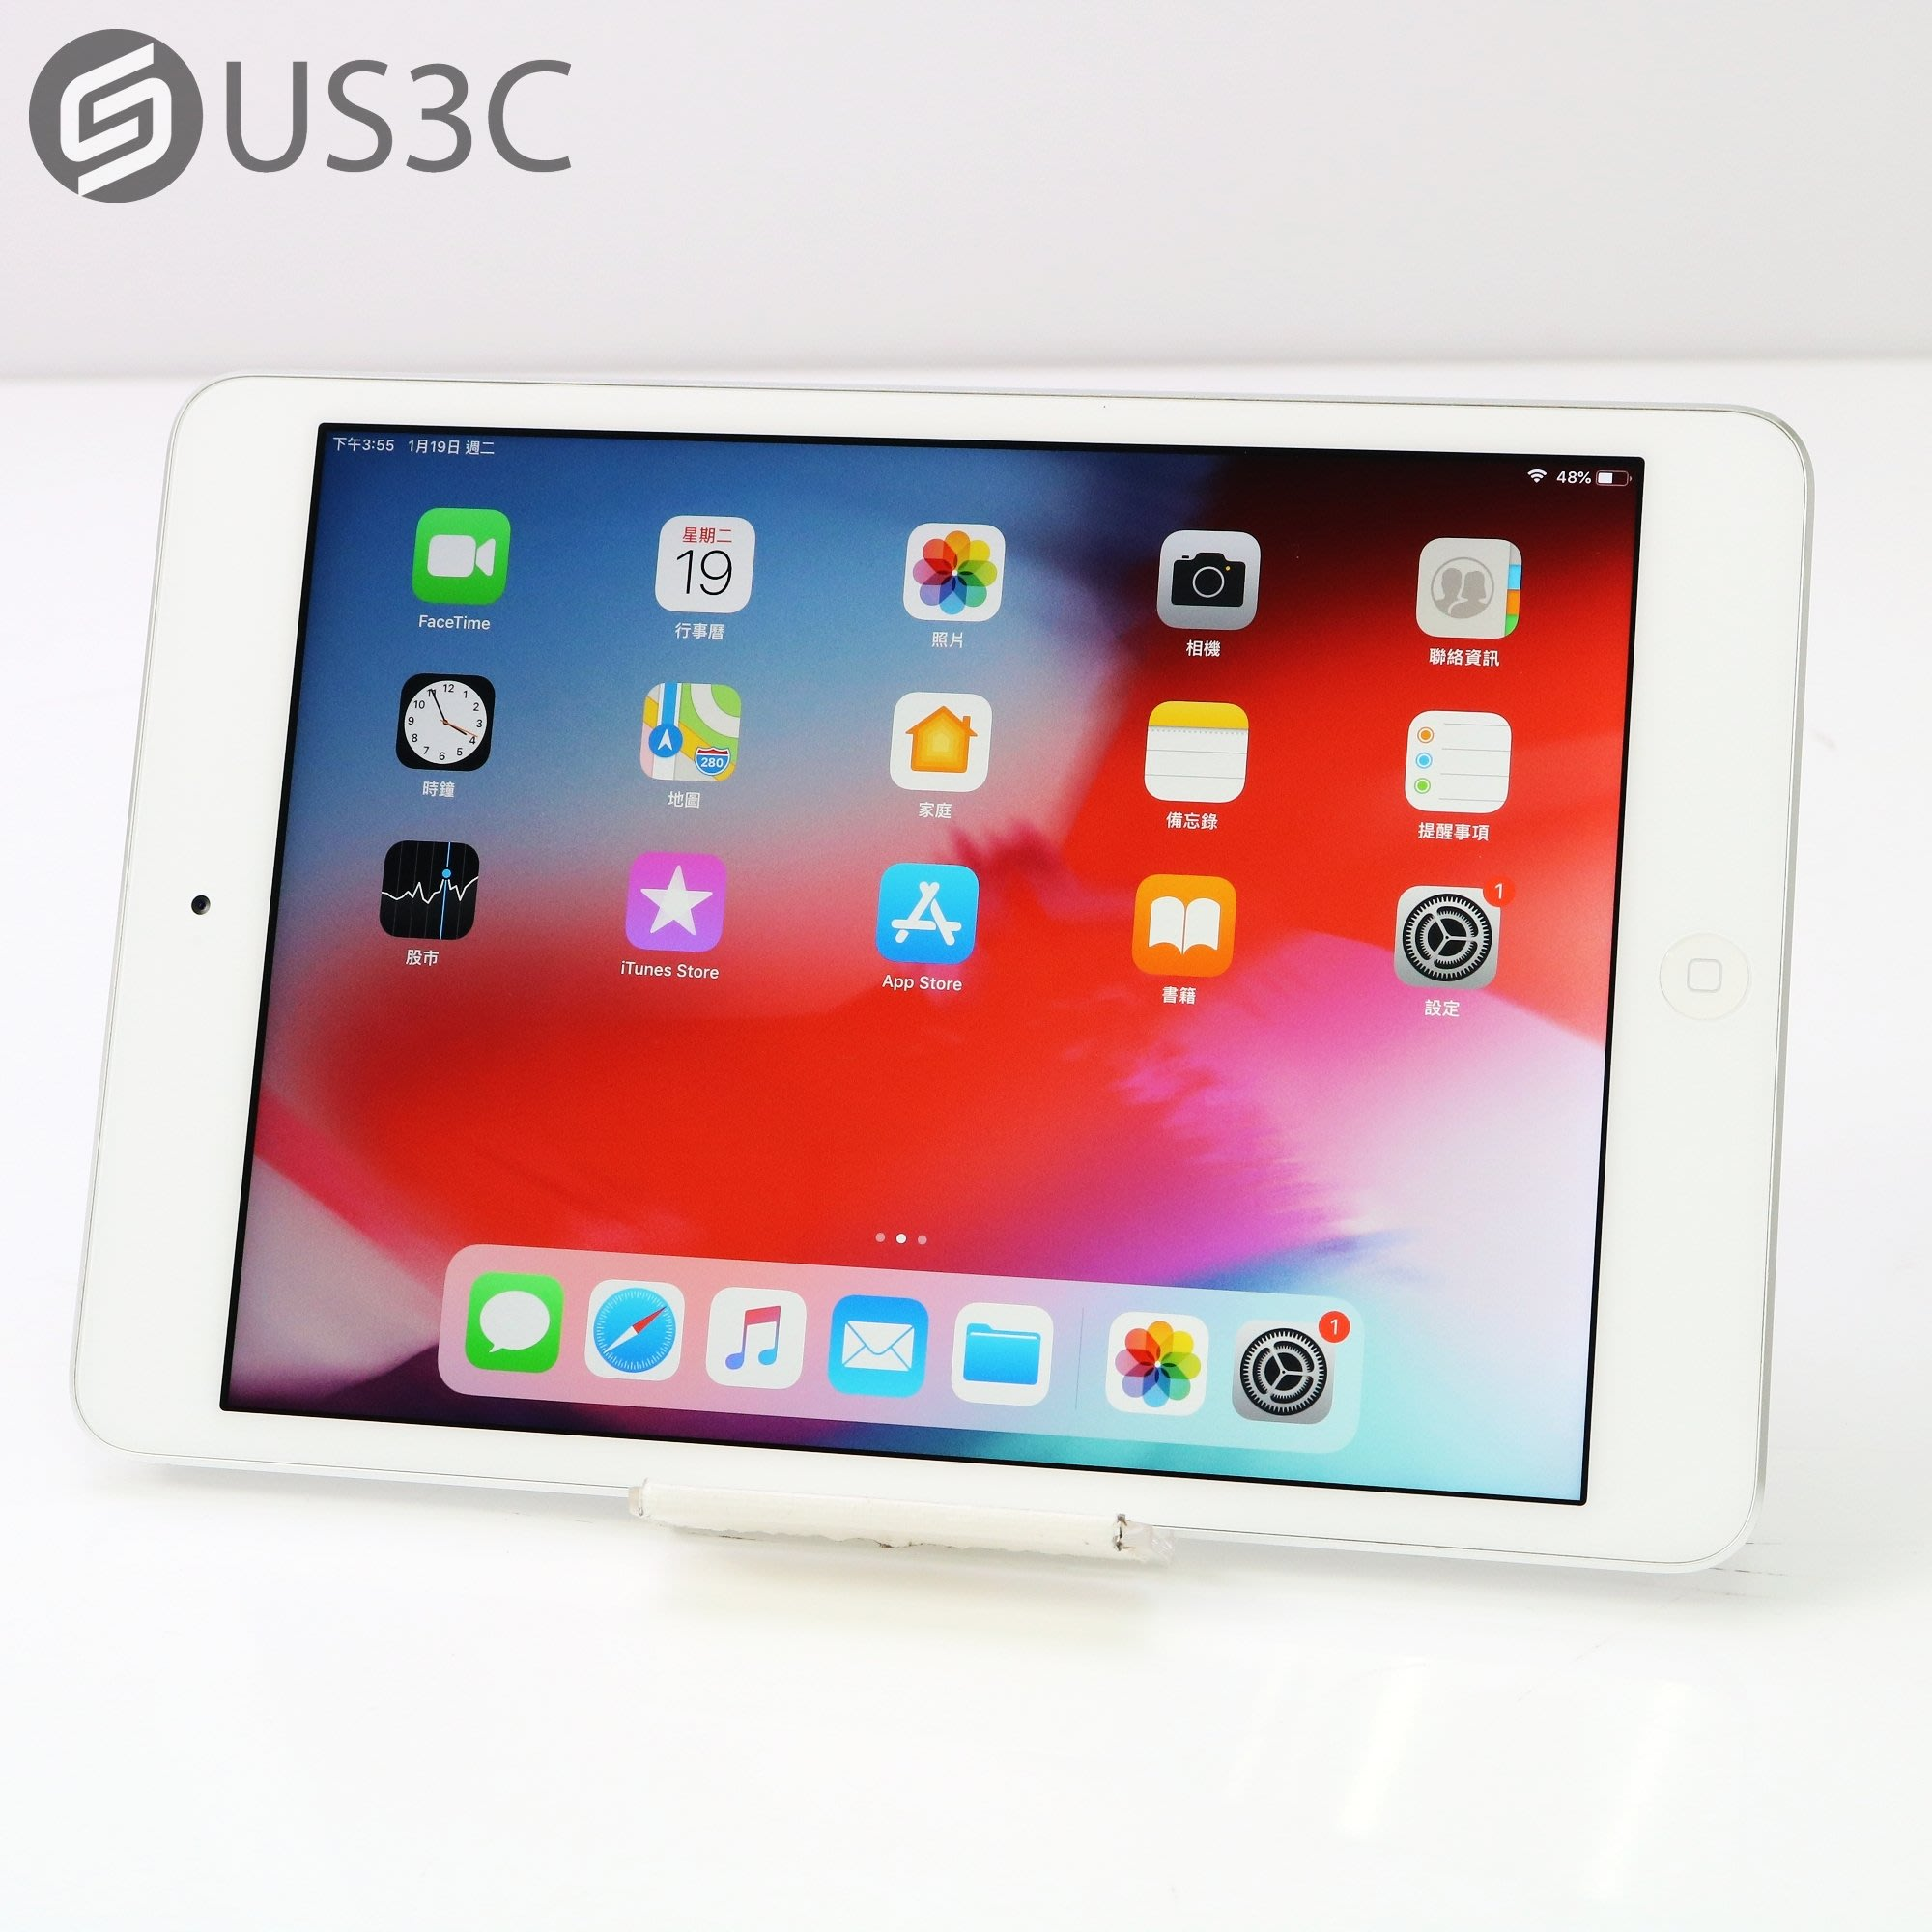 【US3C-松山店】台灣公司貨 Apple iPad mini 2 16G WiFi 7.9吋 銀色 二手平板 平板電腦 500萬畫素 店保3個月